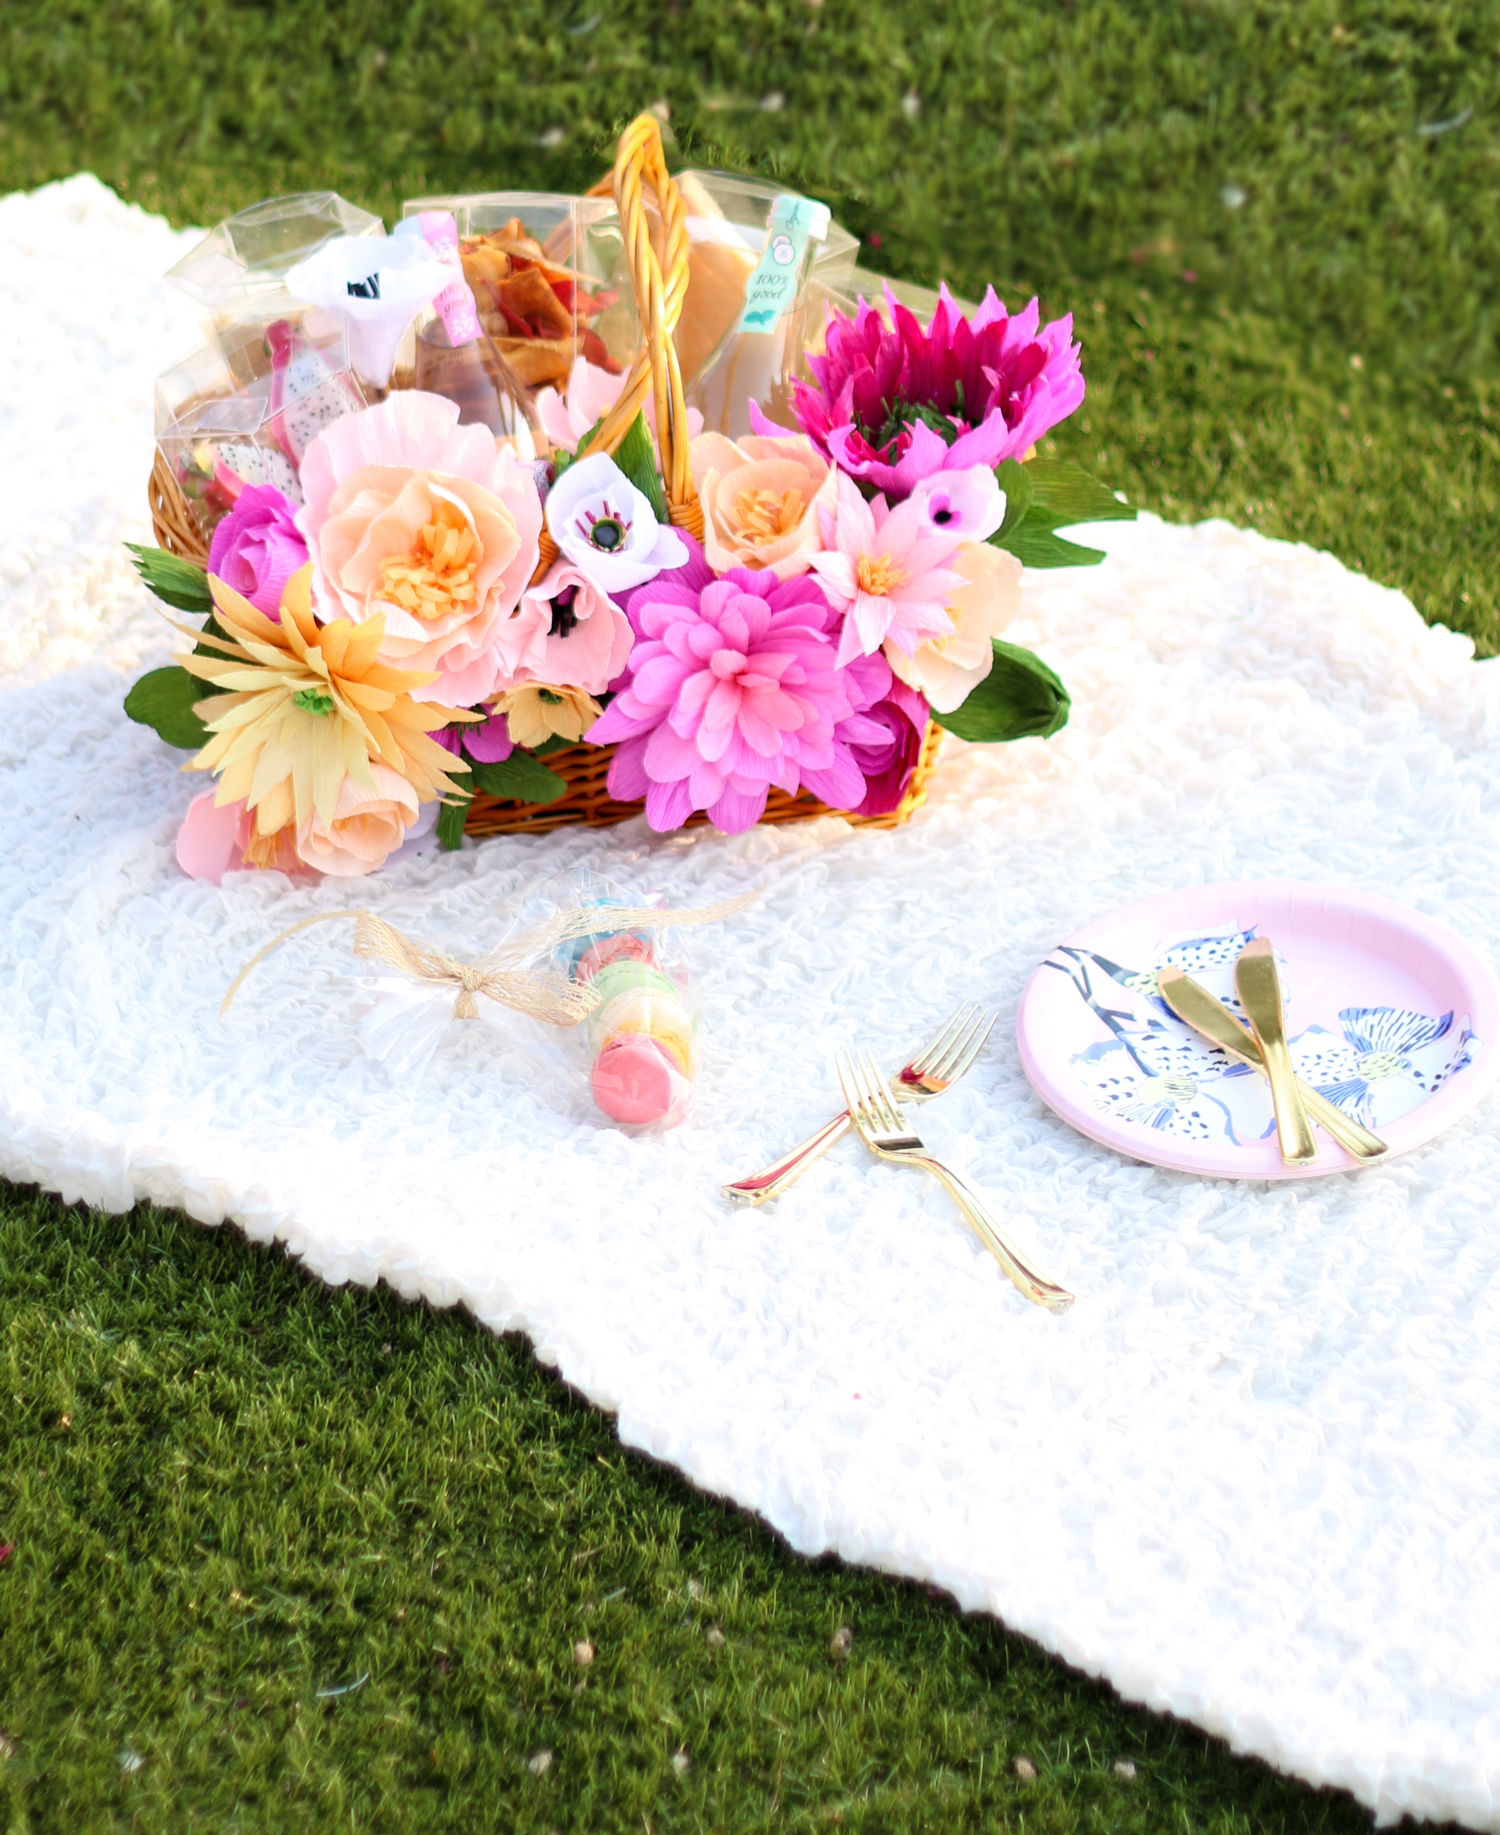 Picnic basket paper flowers table centre.jpg